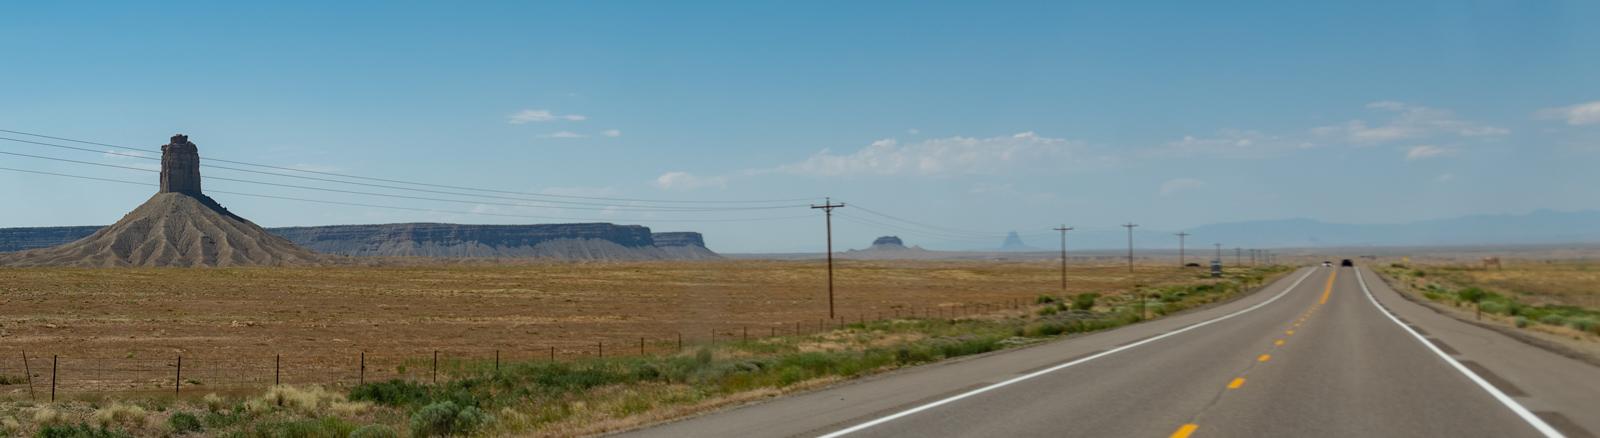 Fantastic highway scenery